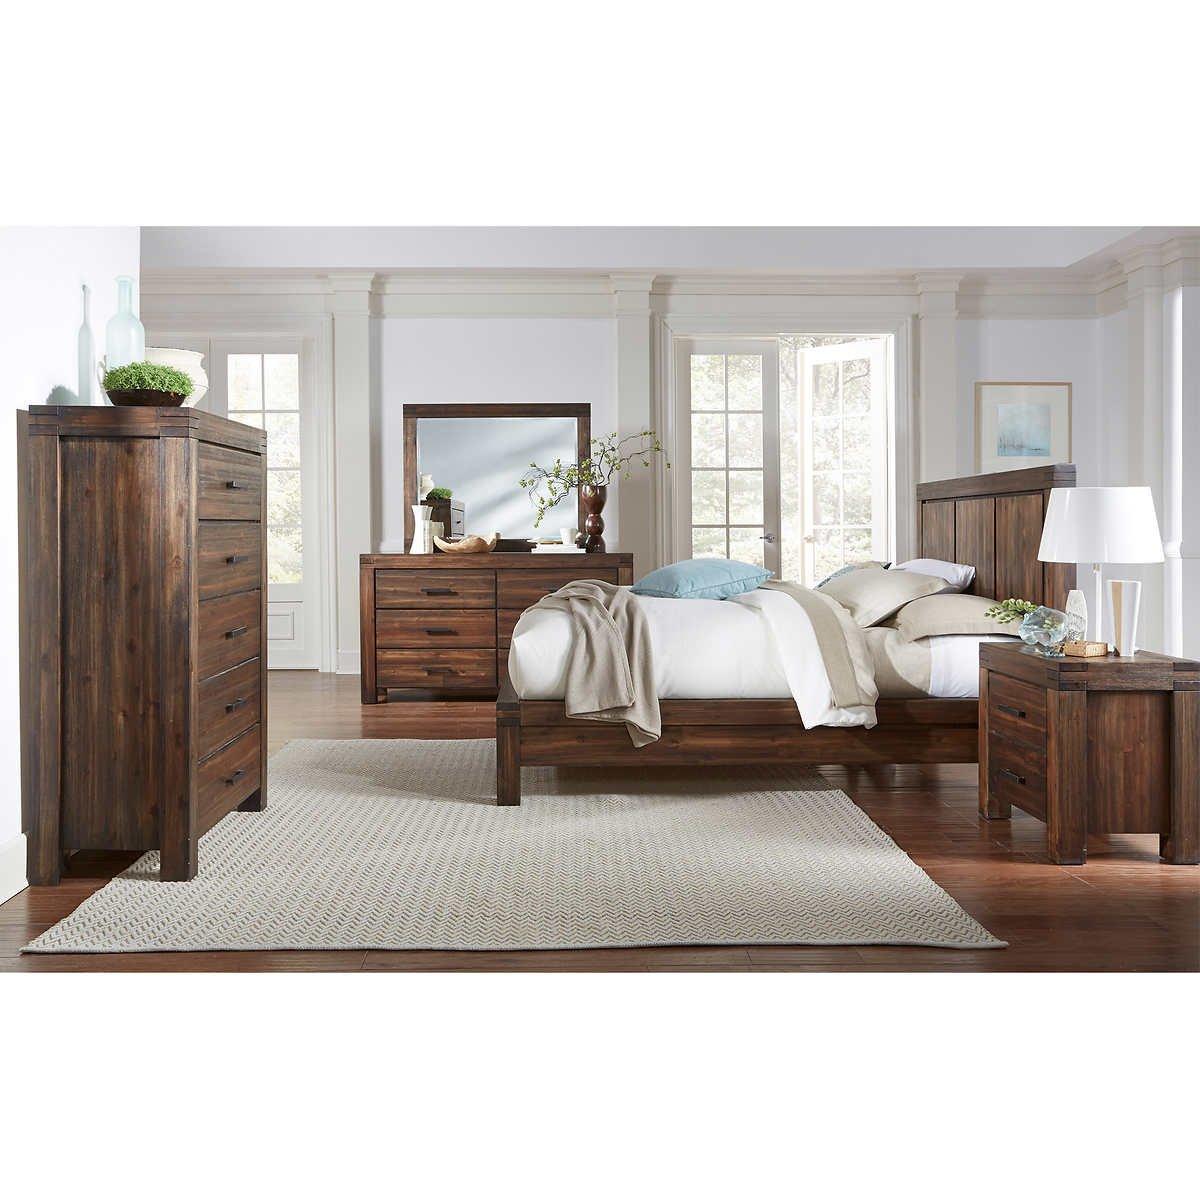 Costco Bedroom Furniture Reviews Best Of Mellina 6 Piece King Bedroom Set